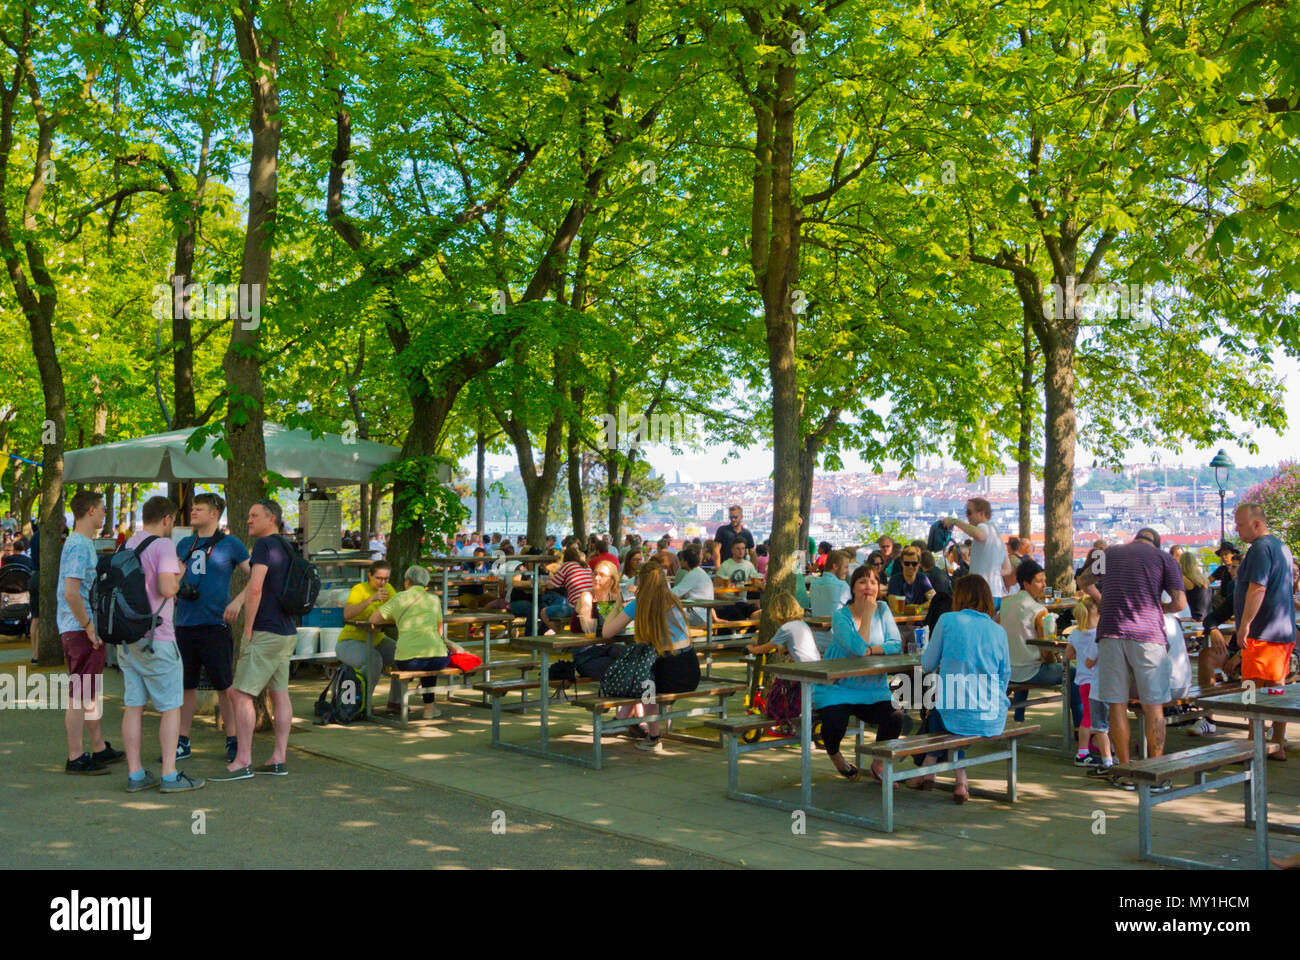 Letenske sady, Letna park, Prague, Czech Republic Stock Photo